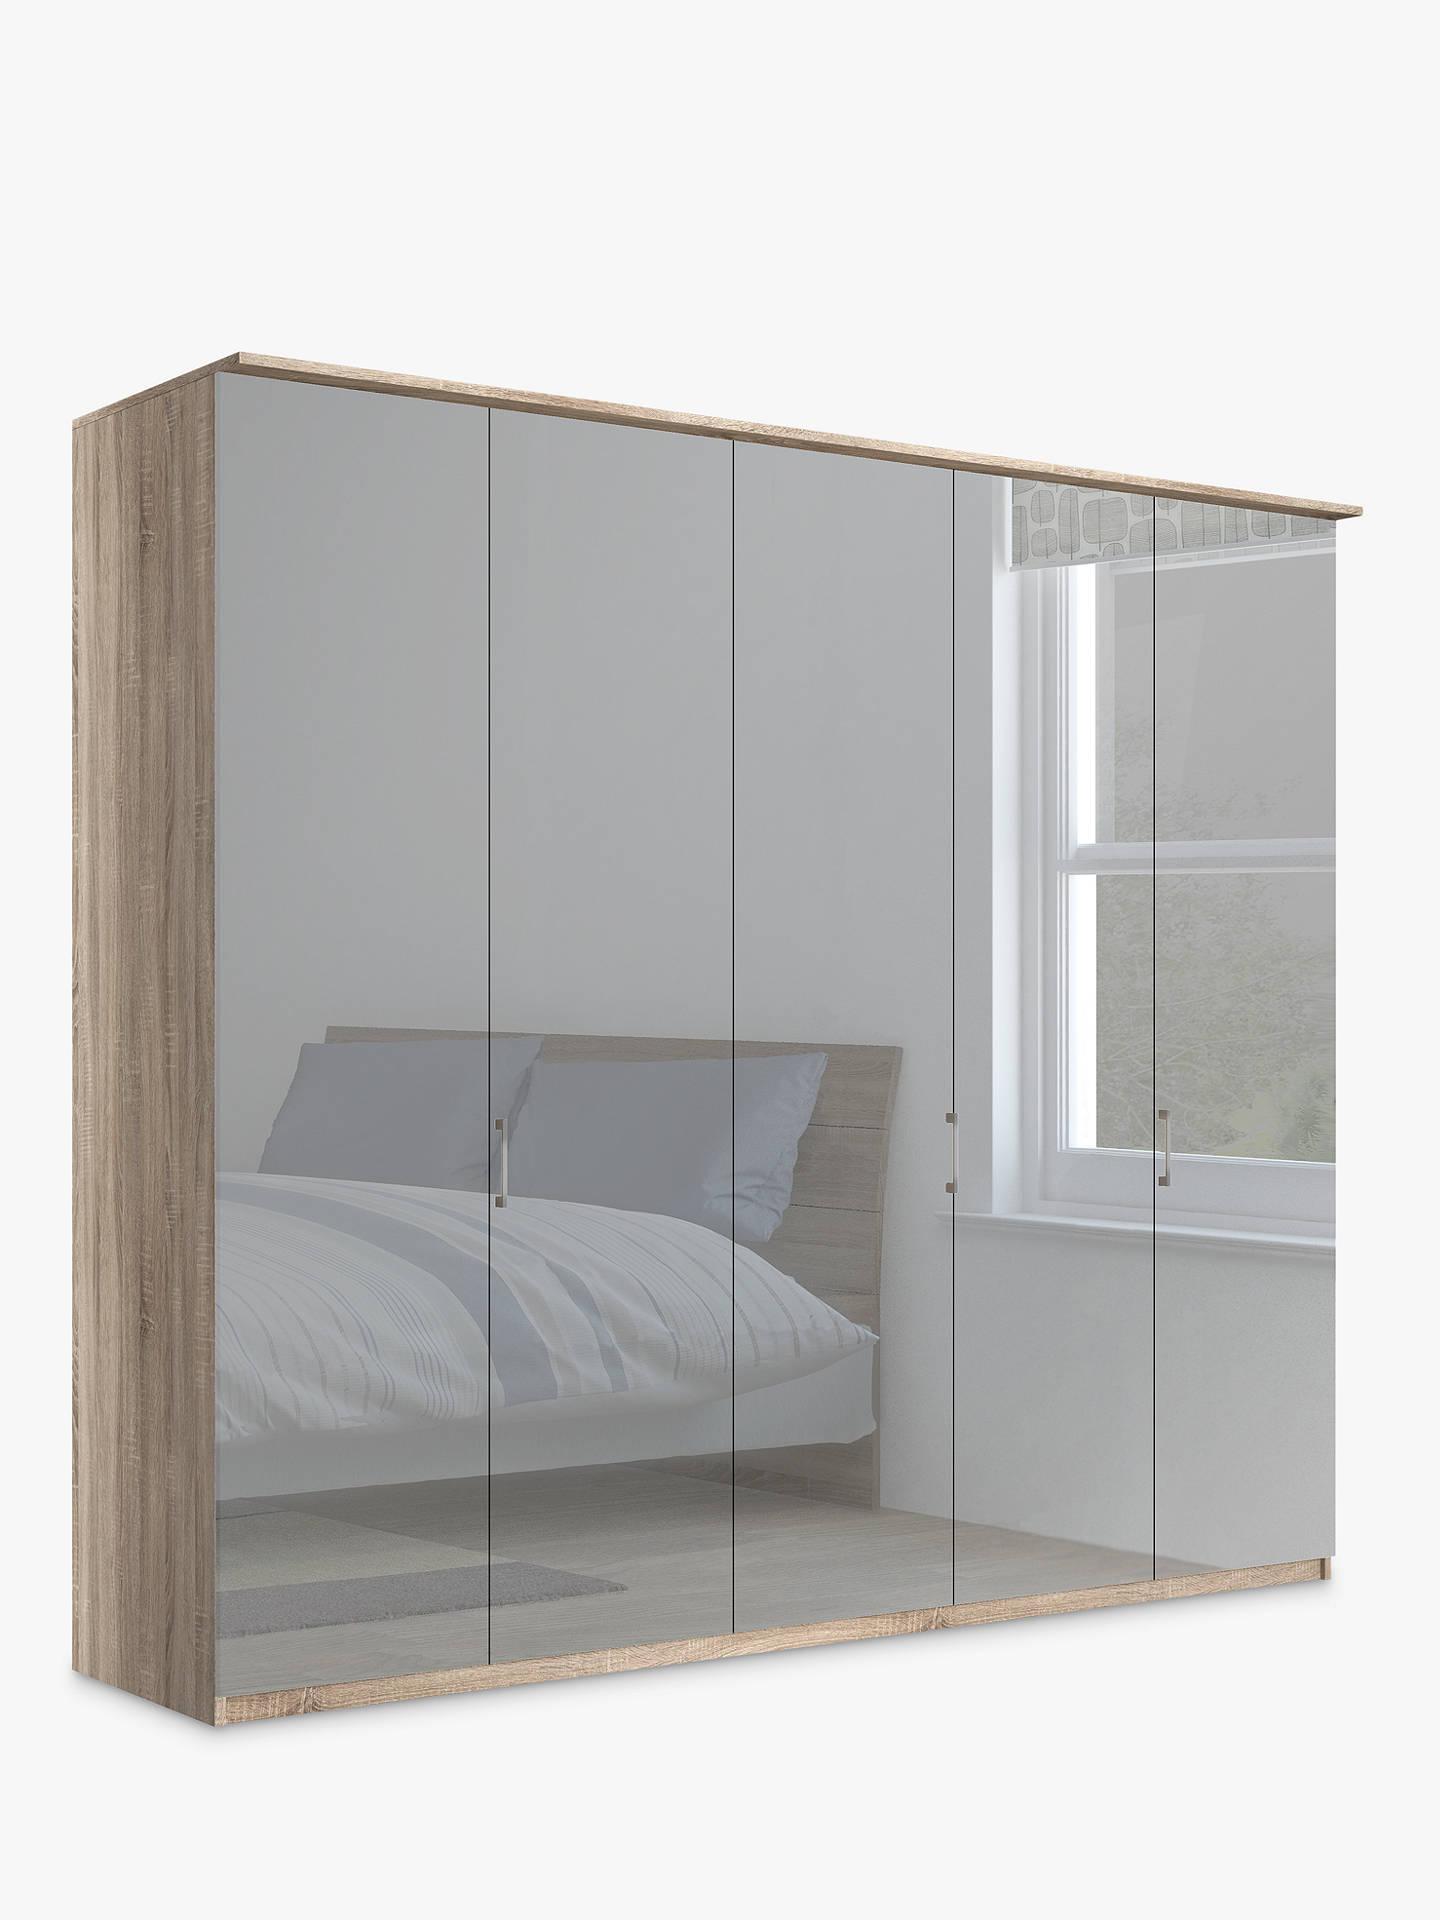 john lewis partners elstra 250cm wardrobe with mirrored. Black Bedroom Furniture Sets. Home Design Ideas